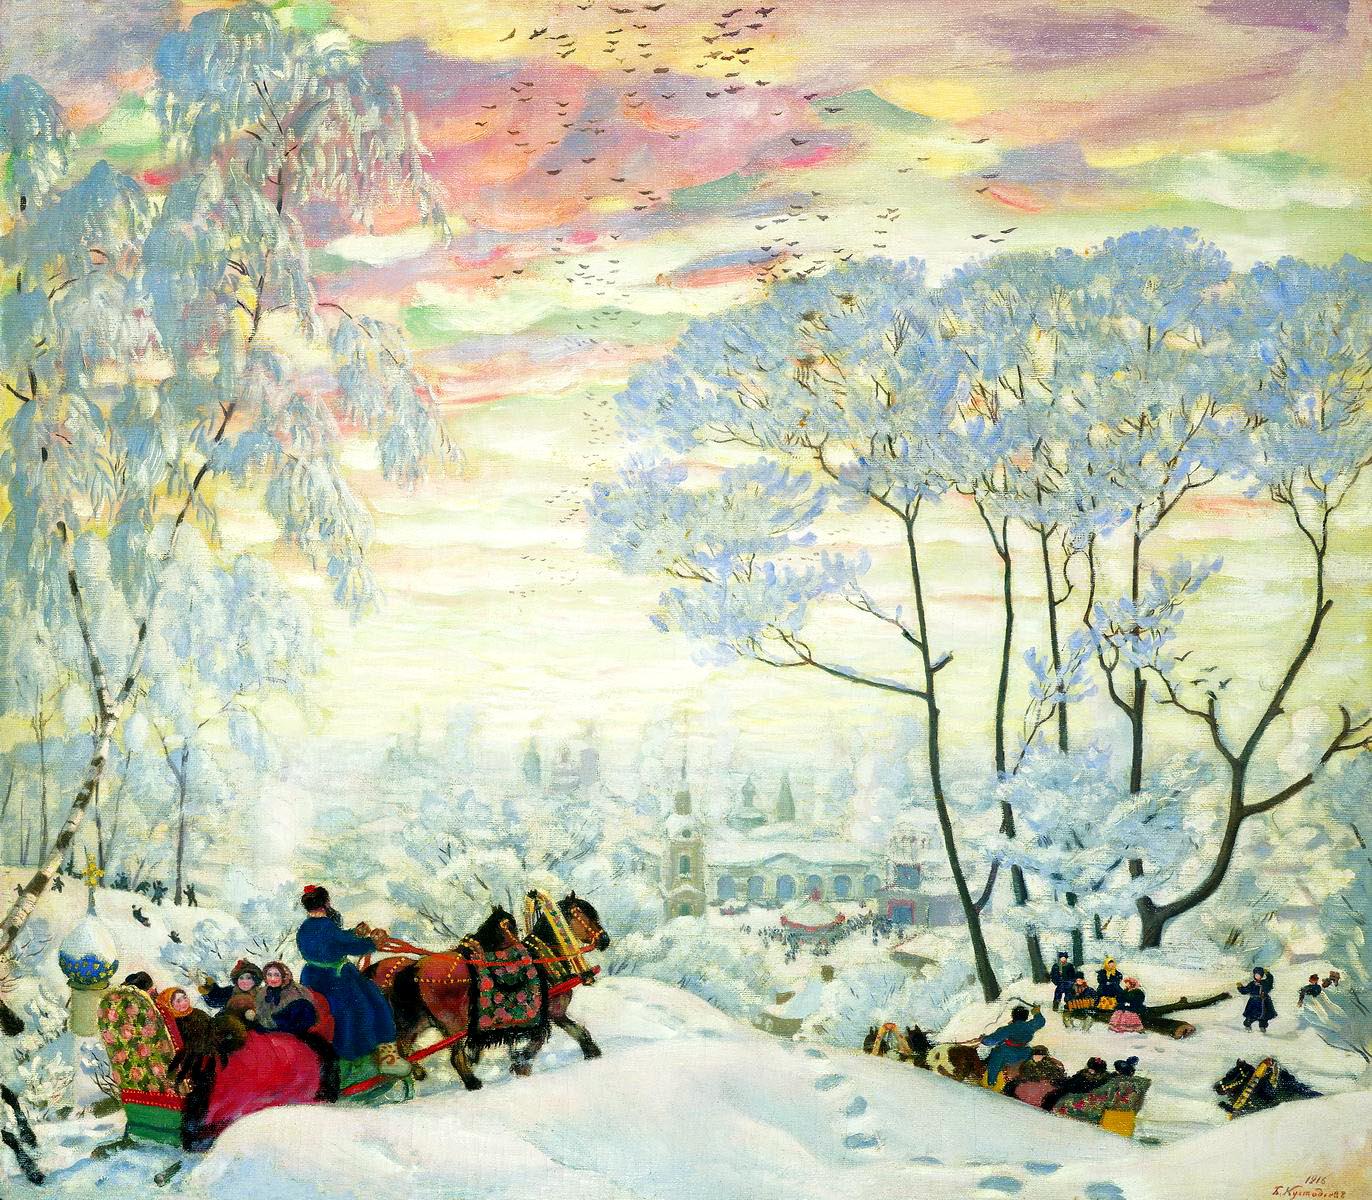 КУСТОДИЕВ Борис - Зима. 1916